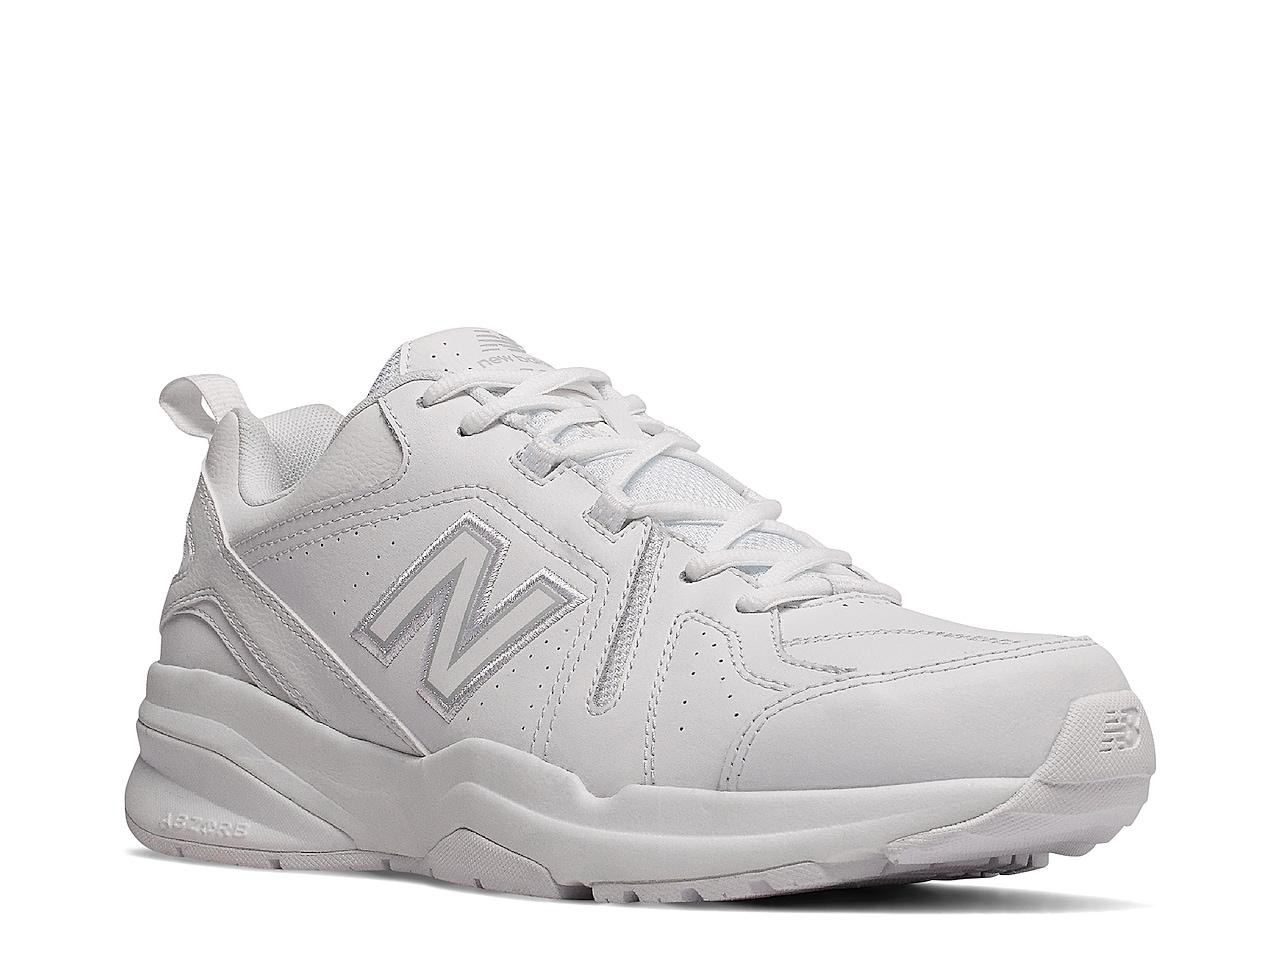 New Balance 608 V5 Training Shoe - Men's : Color - White/Navy, Size - 9.5 (432275)